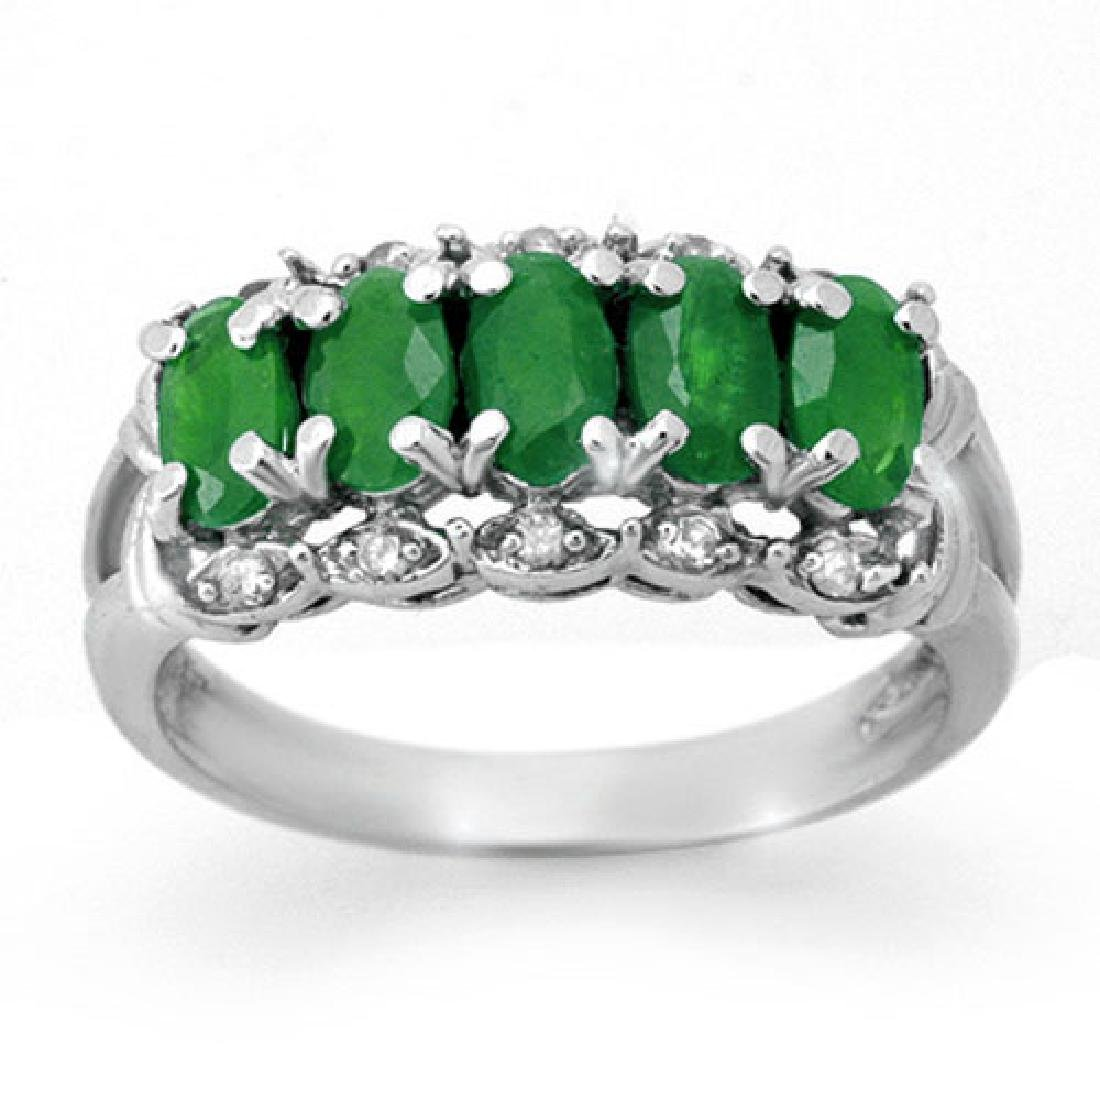 1.75 CTW Emerald & Diamond Ring 18K White Gold